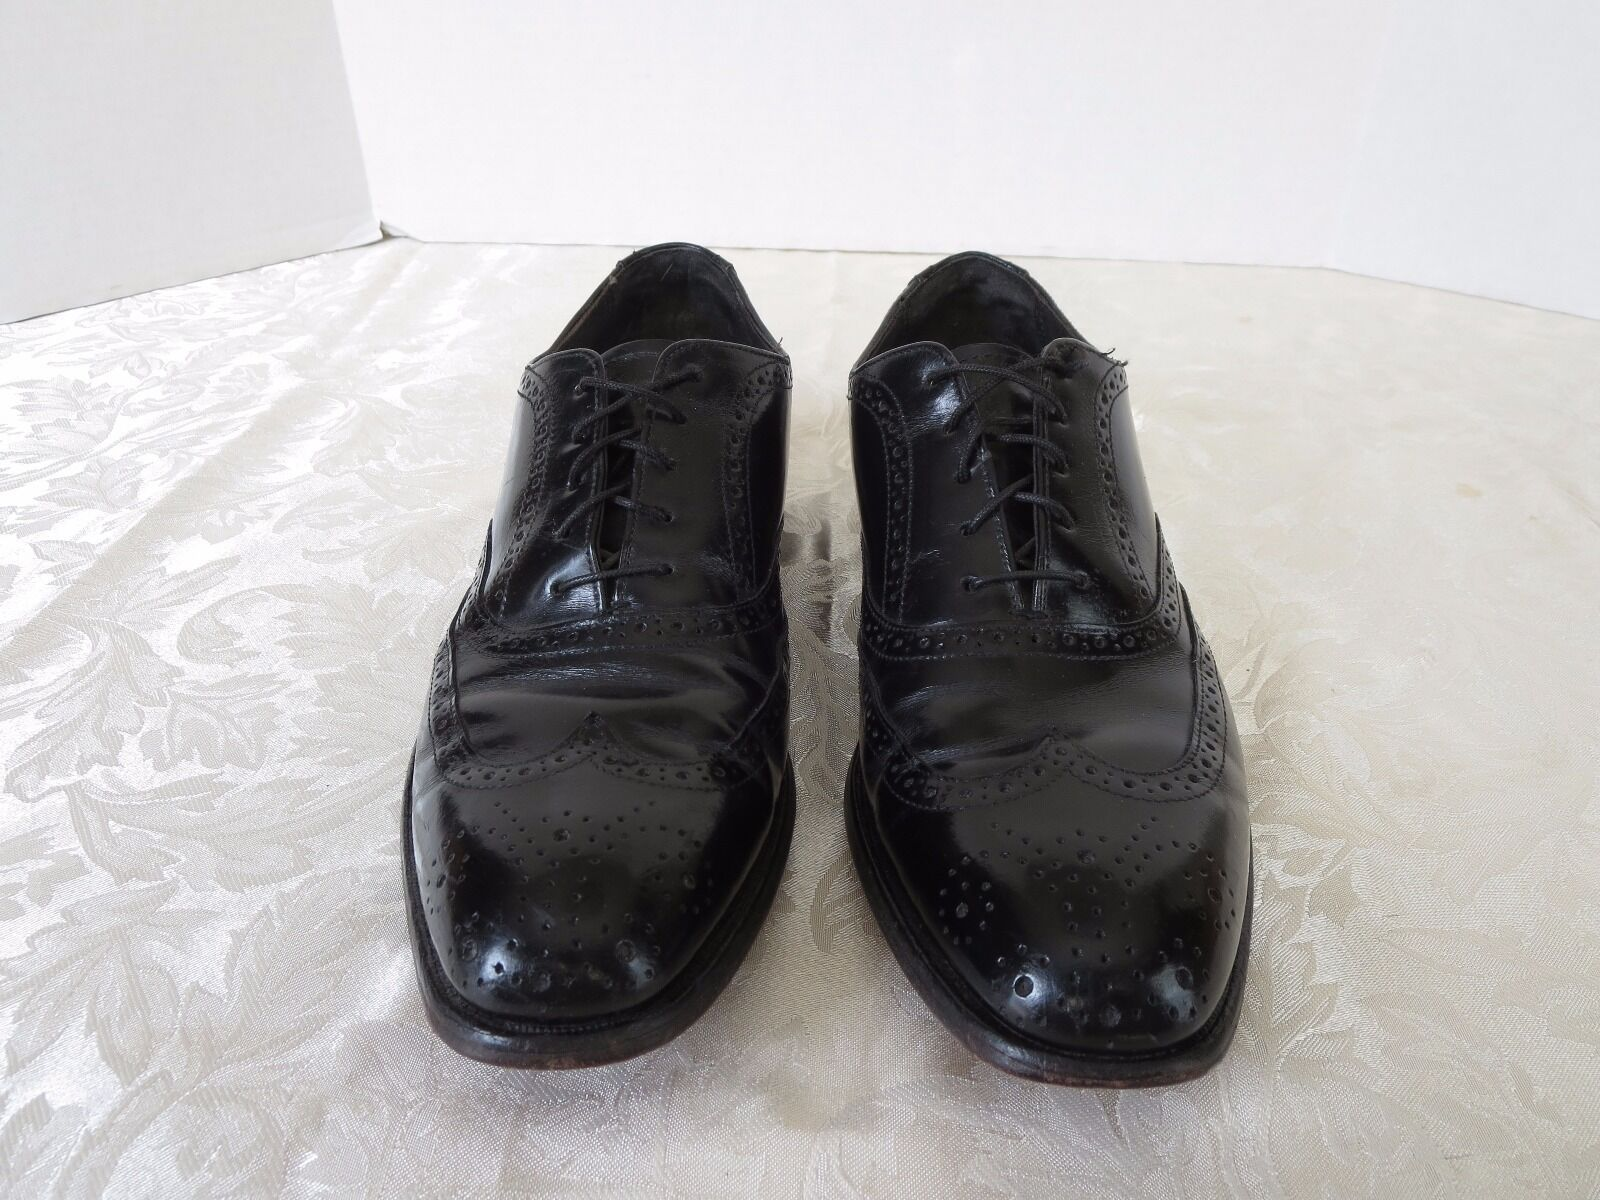 Bostonian Dress Classic Wingtip Leather Footsaver Dress Bostonian Oxford Shoes Men Size 7.5 00d40e